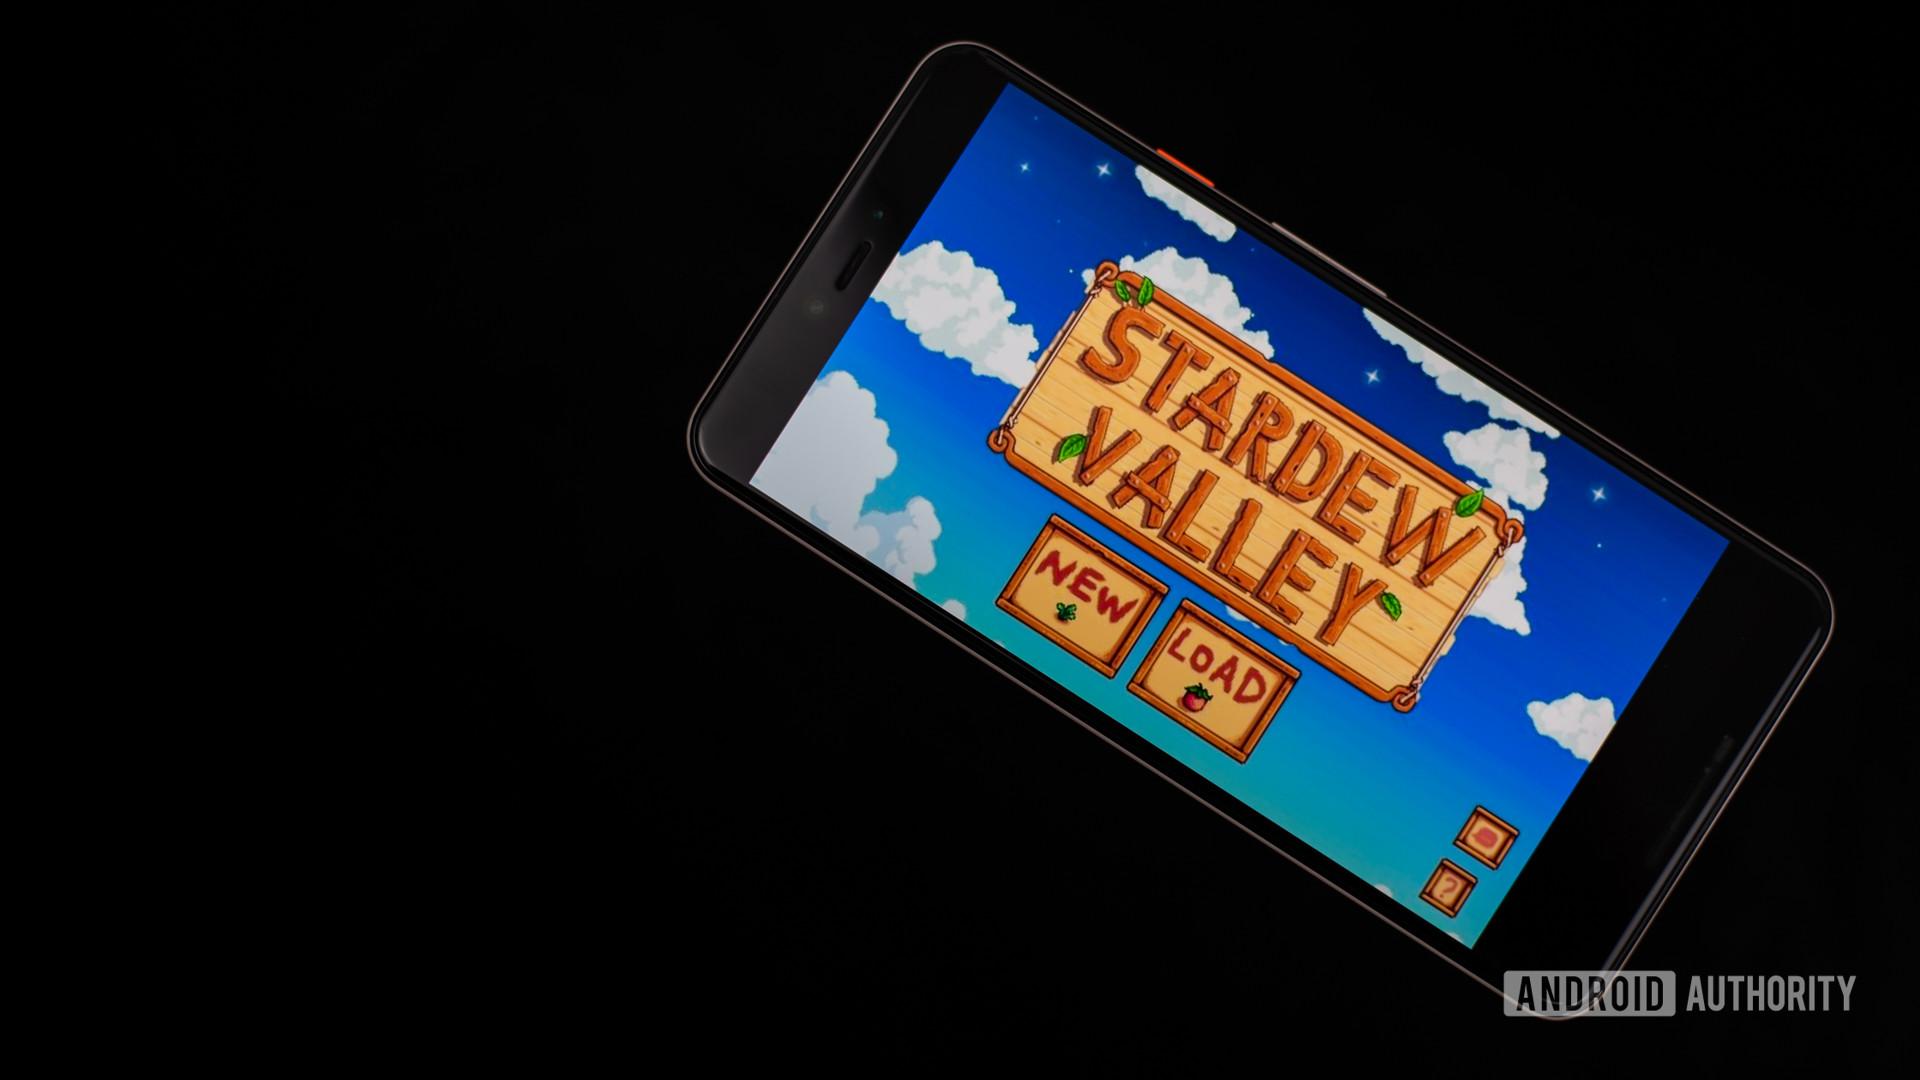 Stardew Valley game stock photo 3